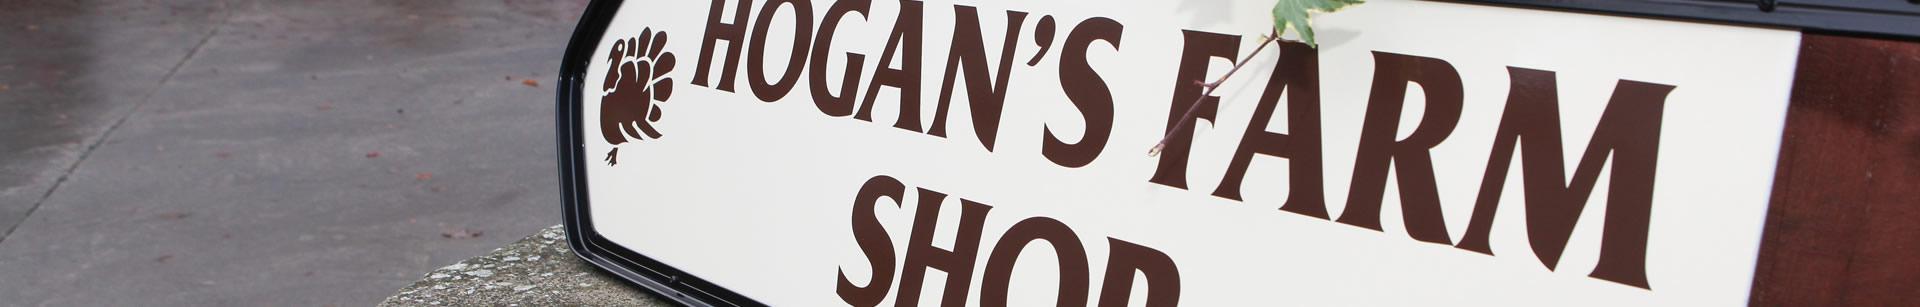 Hogans Farm